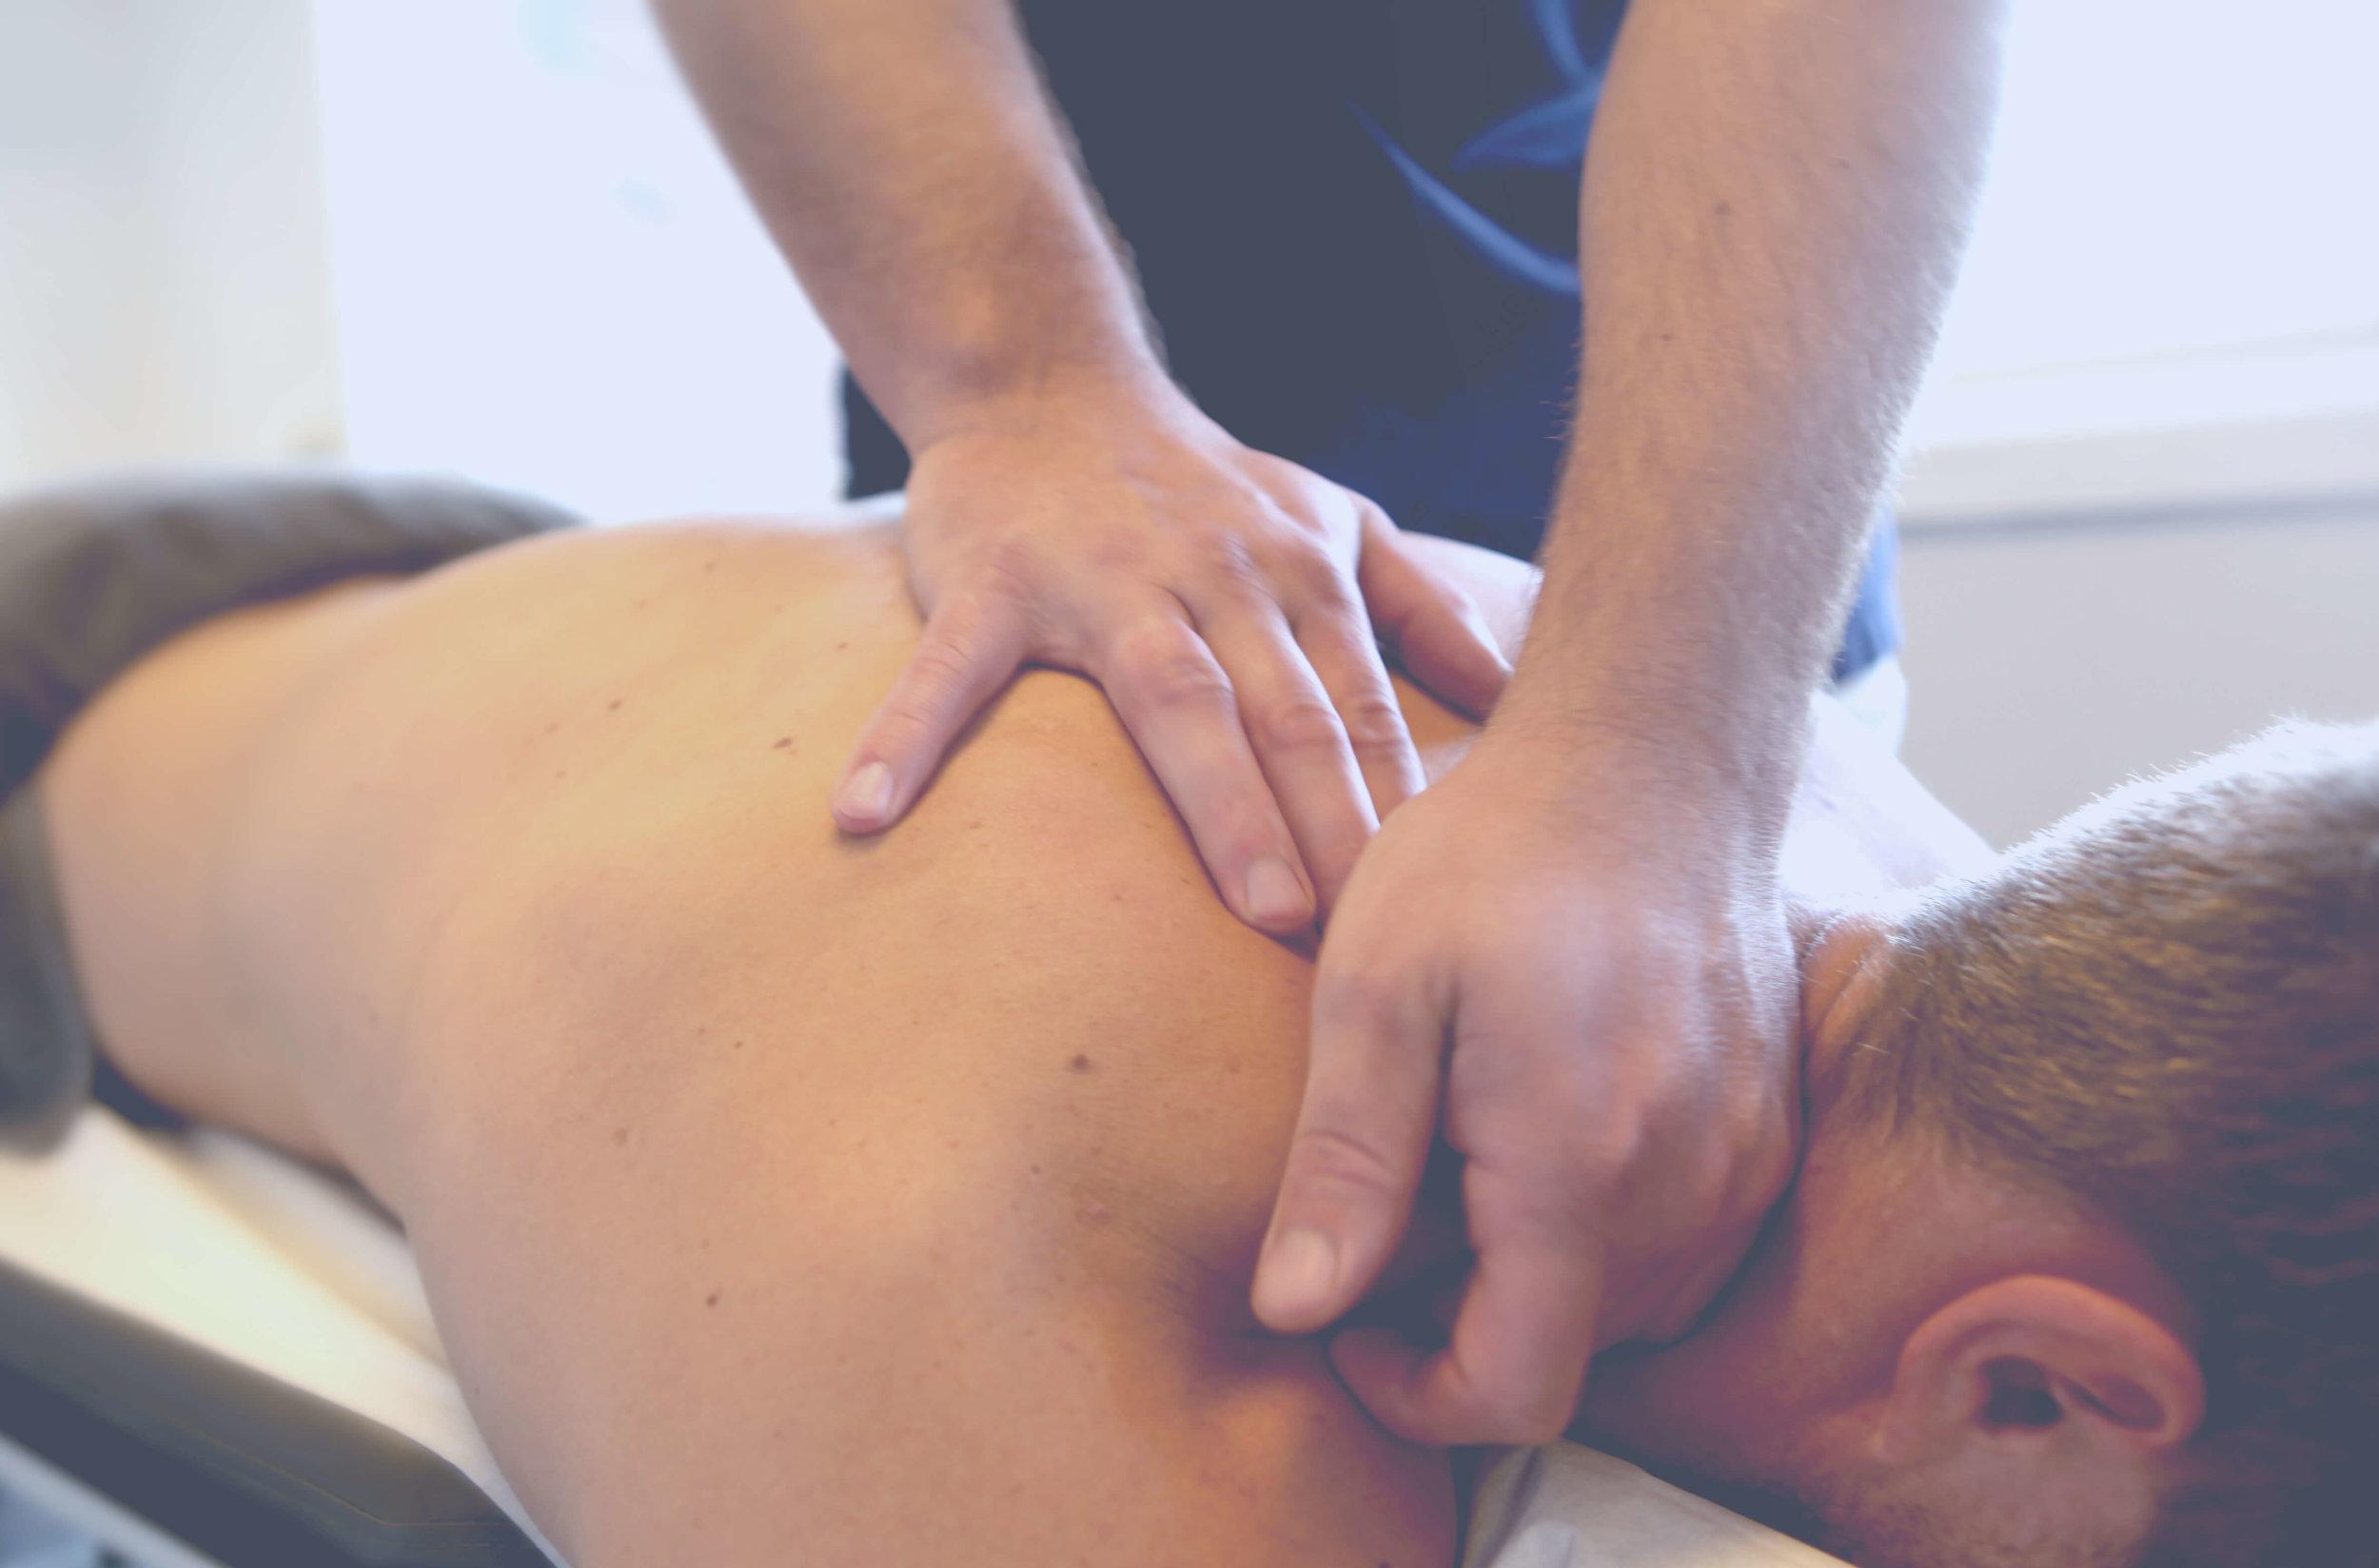 Doktorgaarden-Naprapati-og-Massasje-behandlinger-massasje